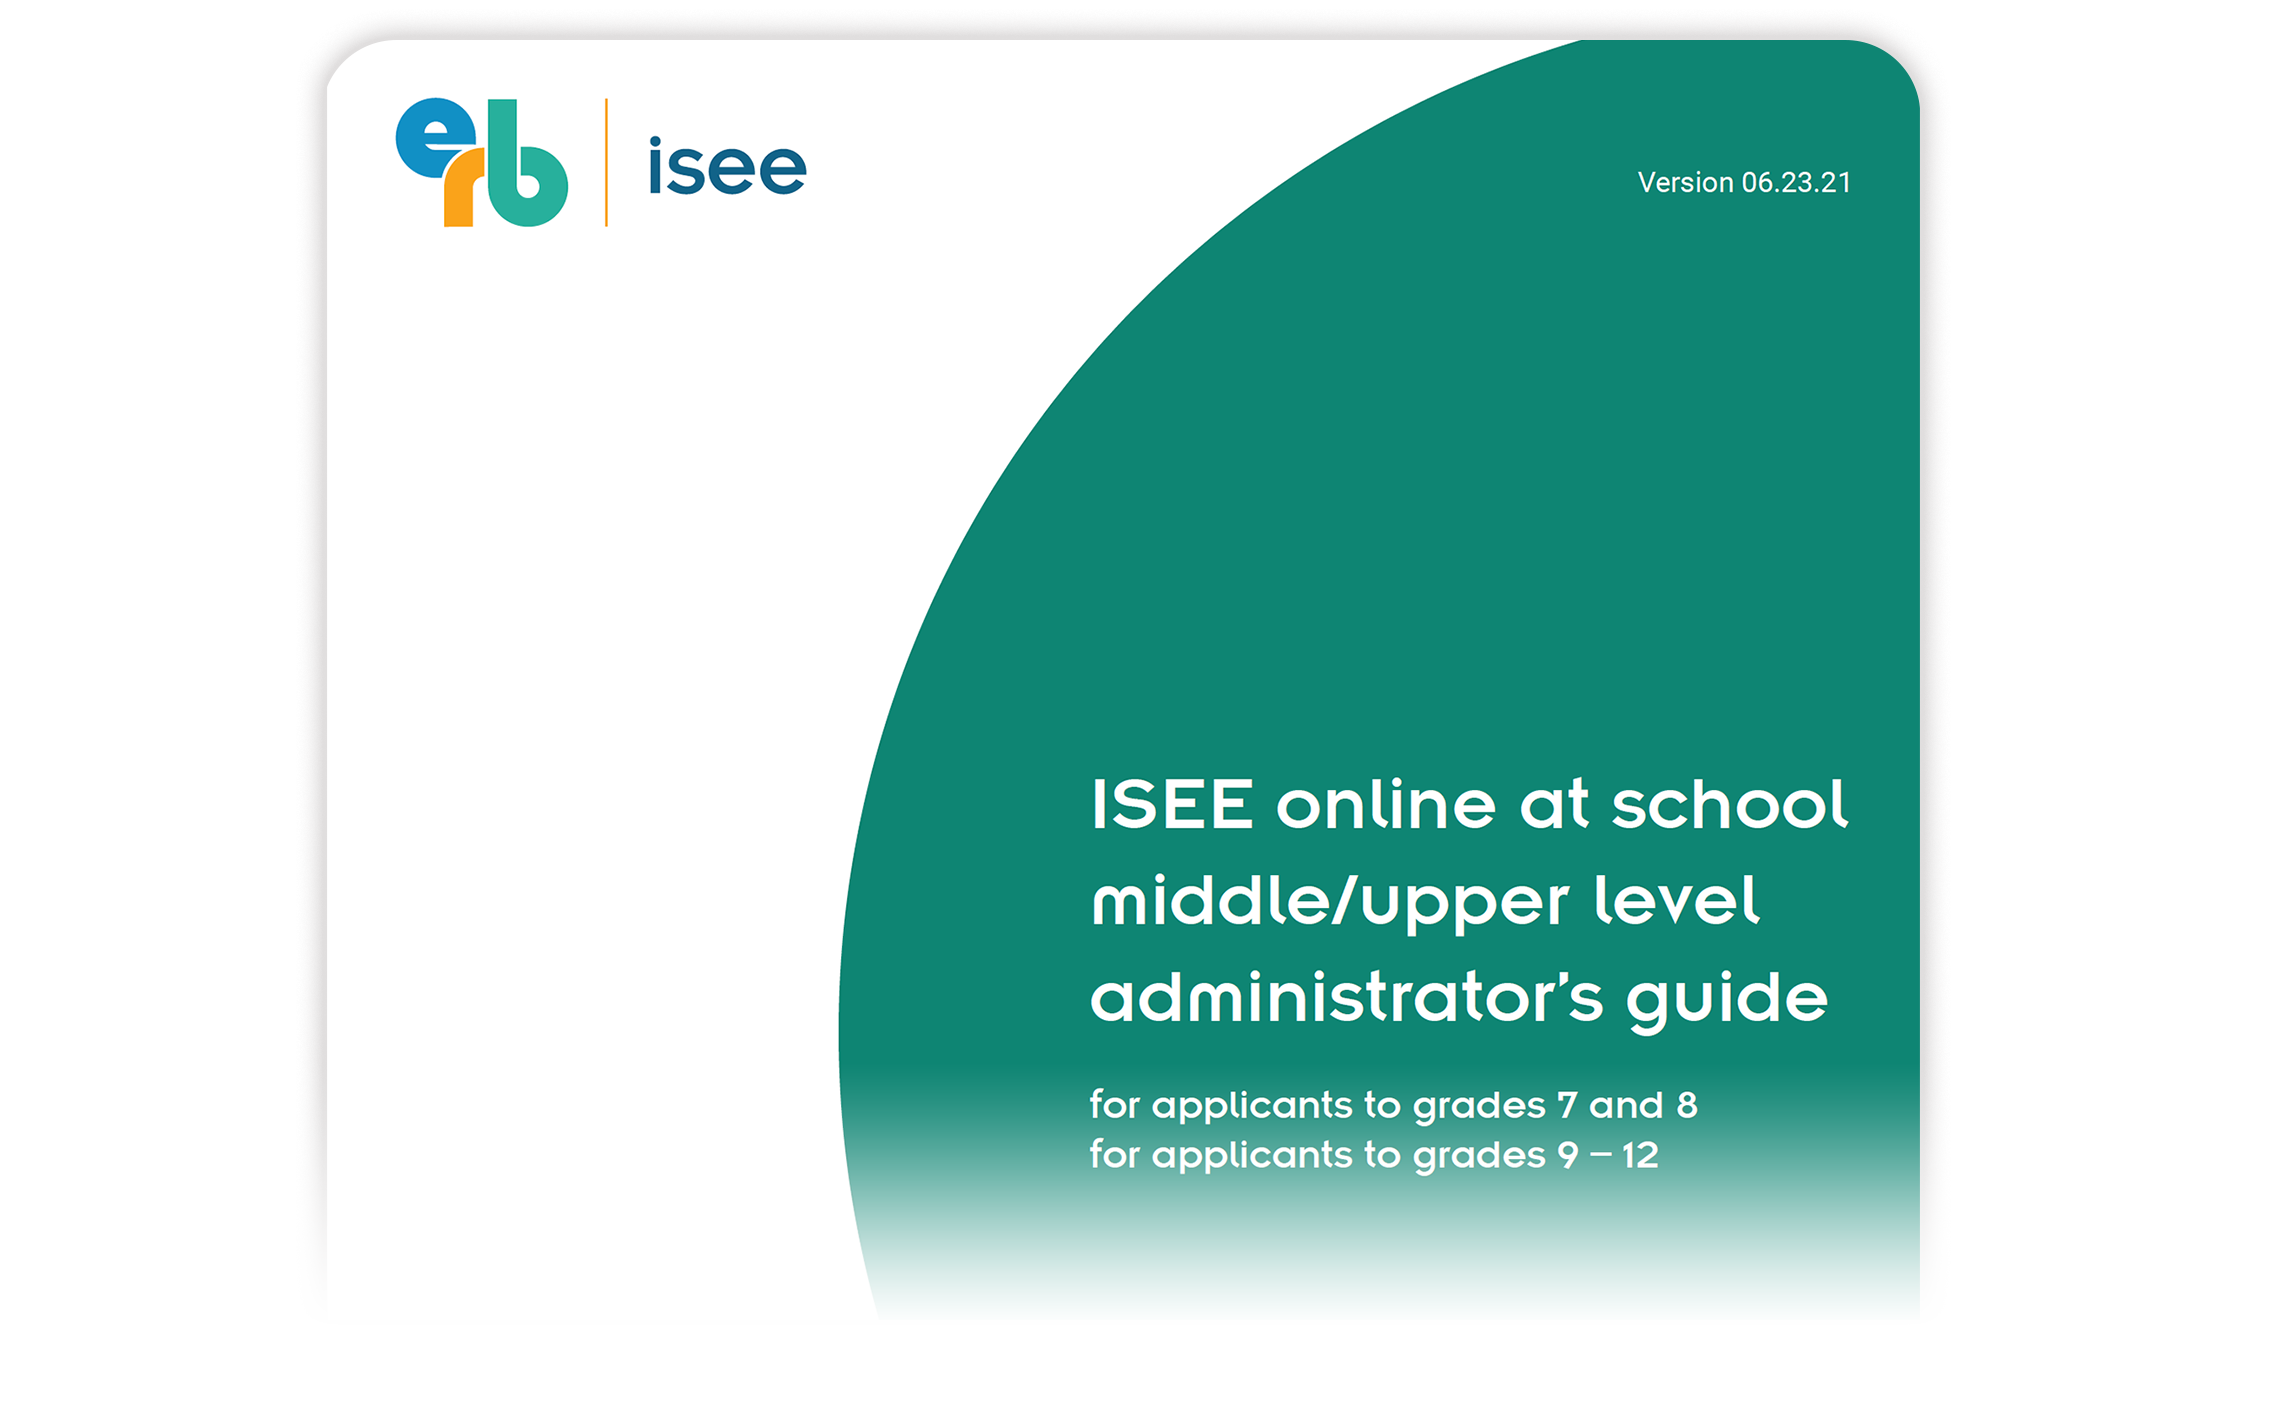 isee-online-at-school-guide